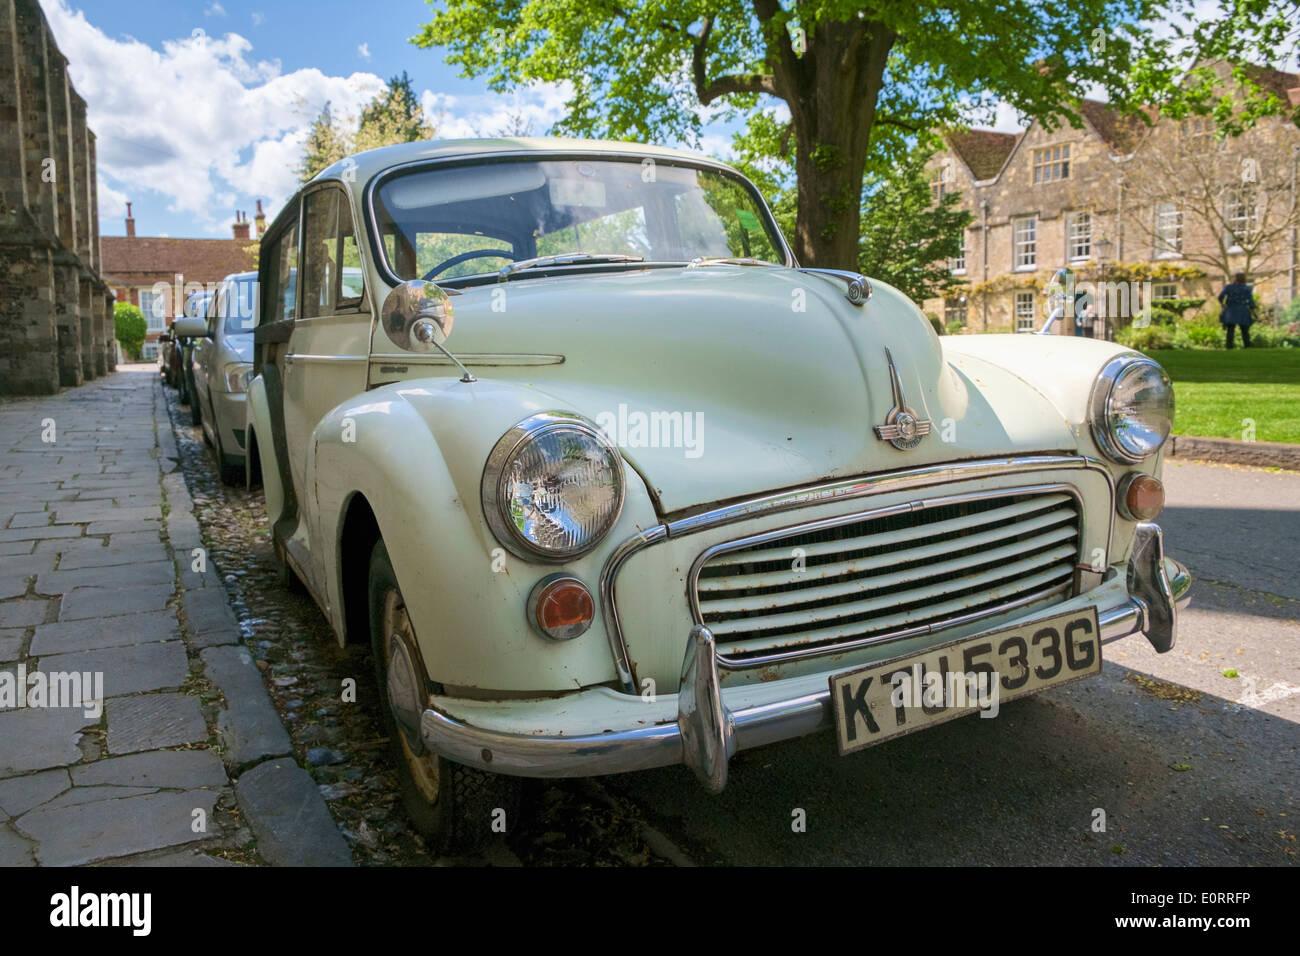 Morris Minor 1000 Traveler, a vintage car built in 1968, England, UK - Stock Image